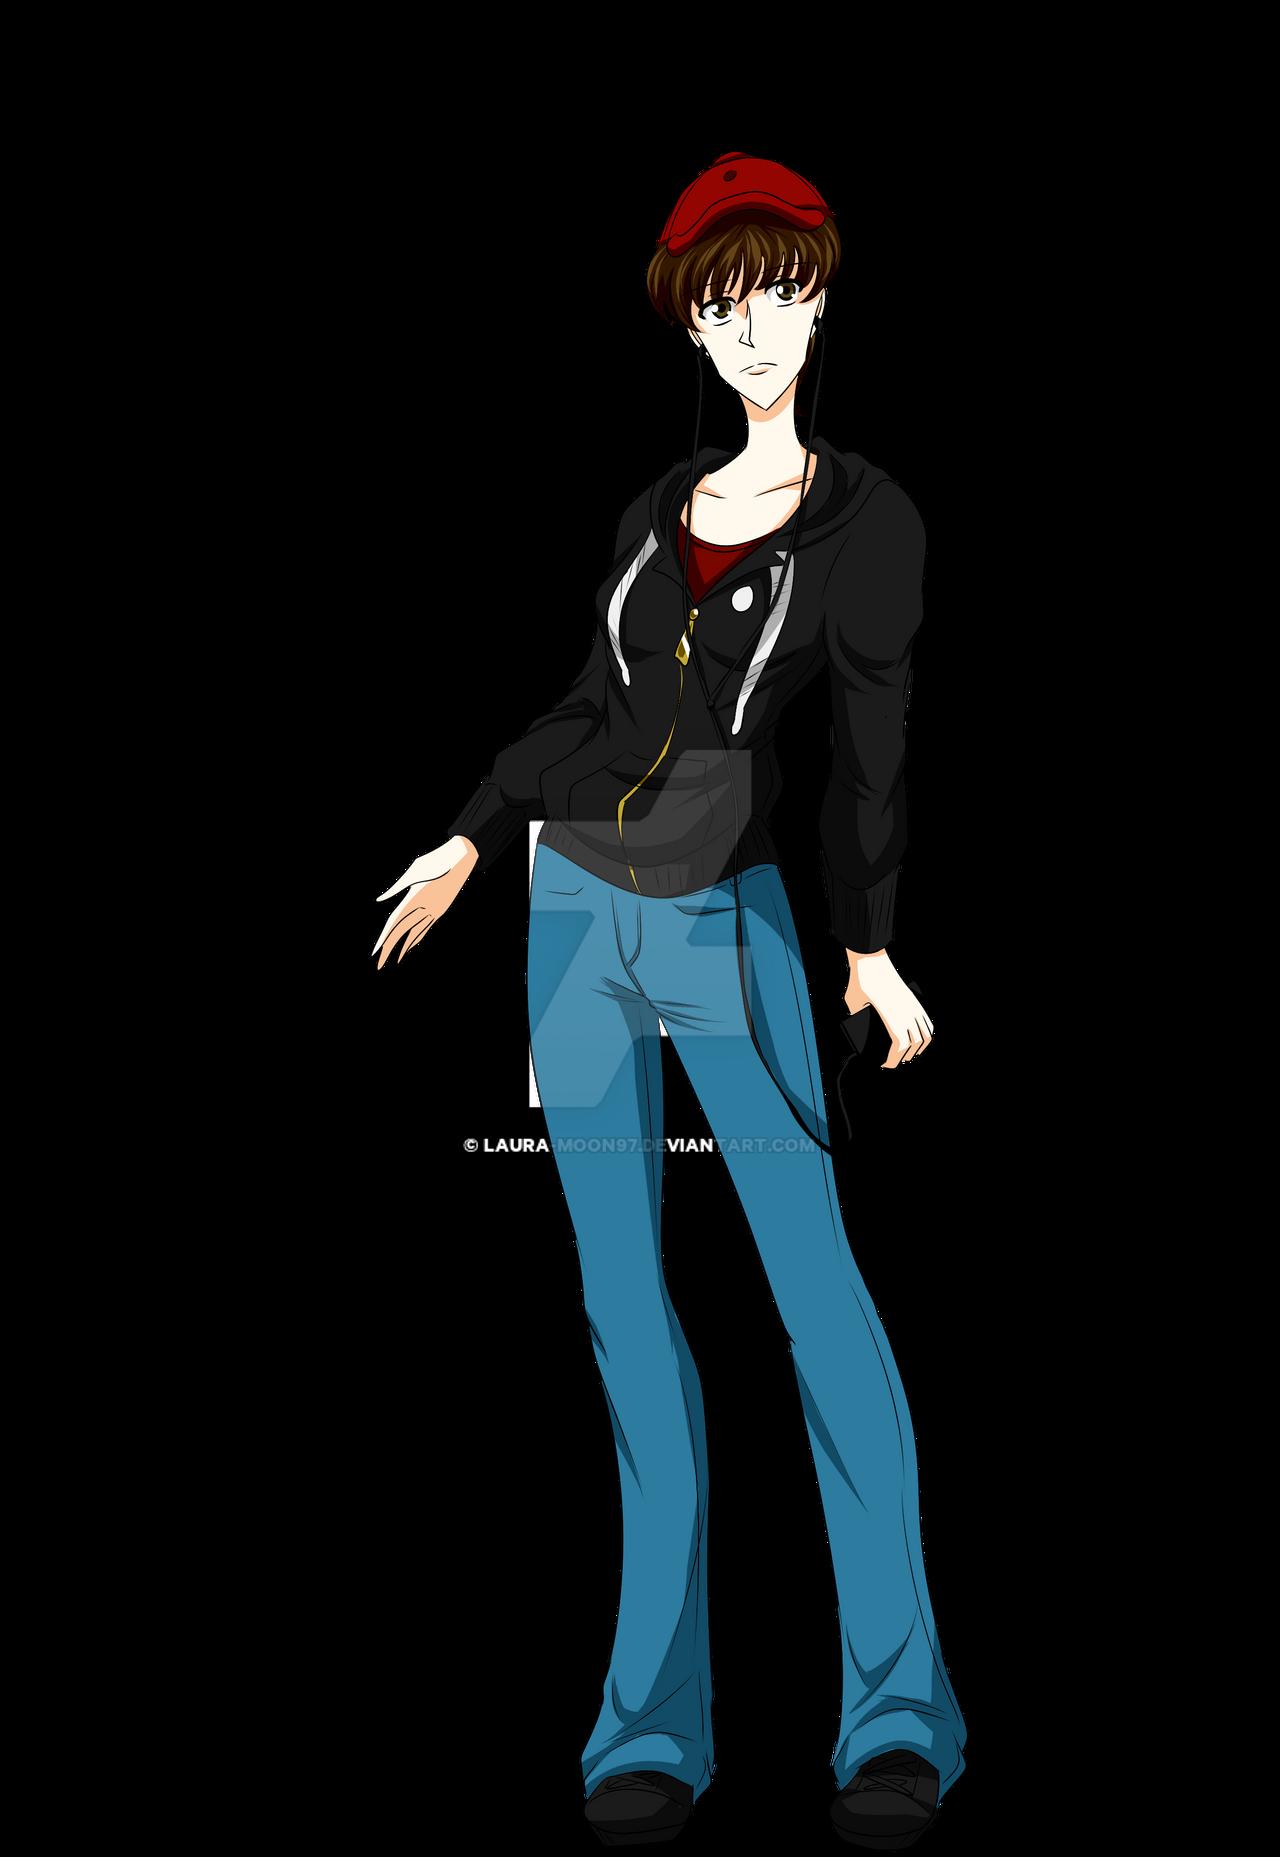 Laura Nyman Character by Laura-Moon97